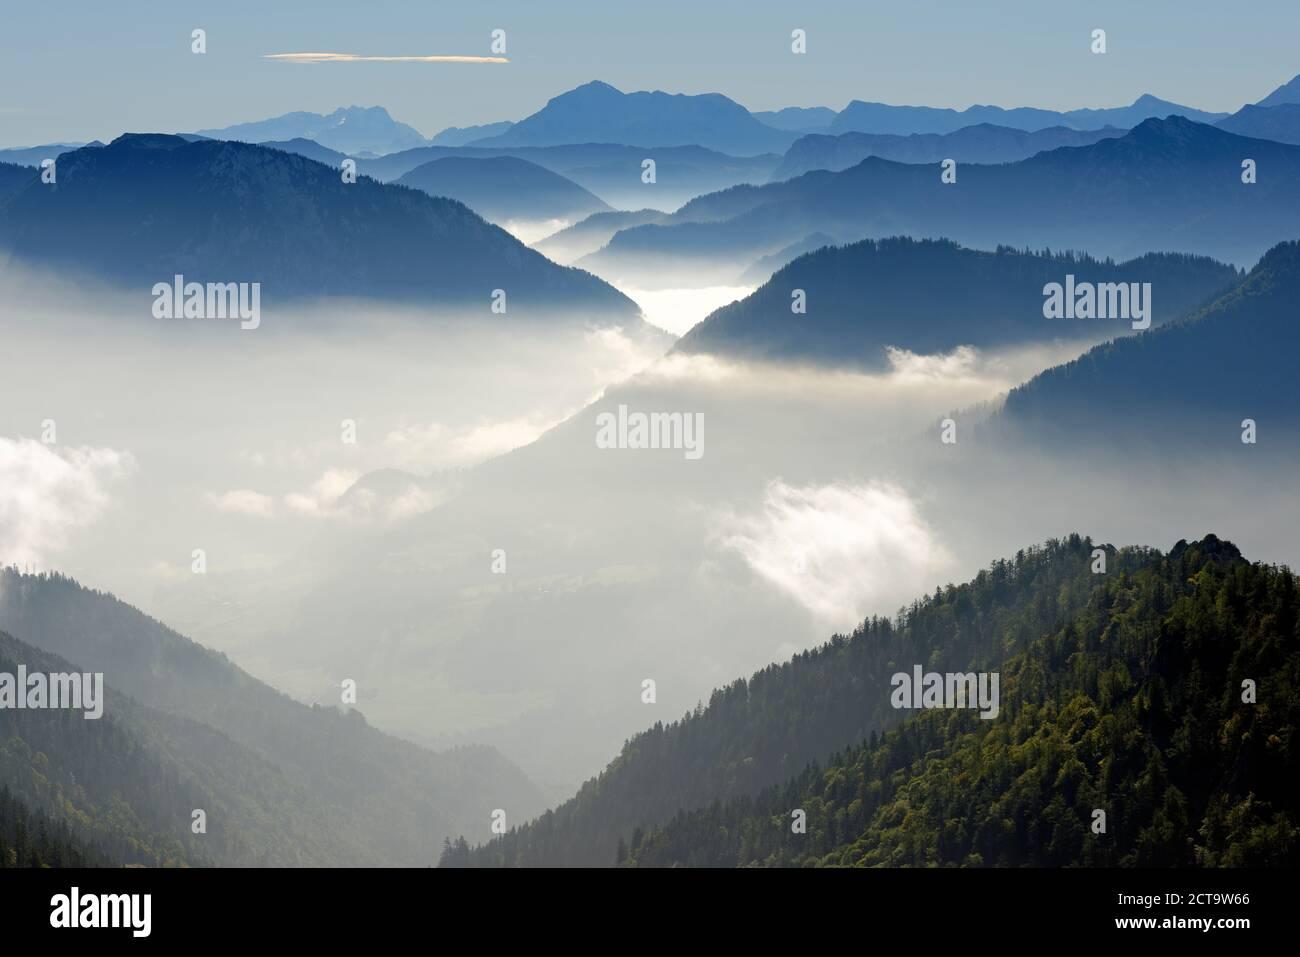 Germany, Upper Bavaria, Bavaria, Chiemgau Alps, Bergen, Rauschberg, Dachstein, Hoher Goell, Hohes Brett and Aibleck from Hochfelln Stock Photo